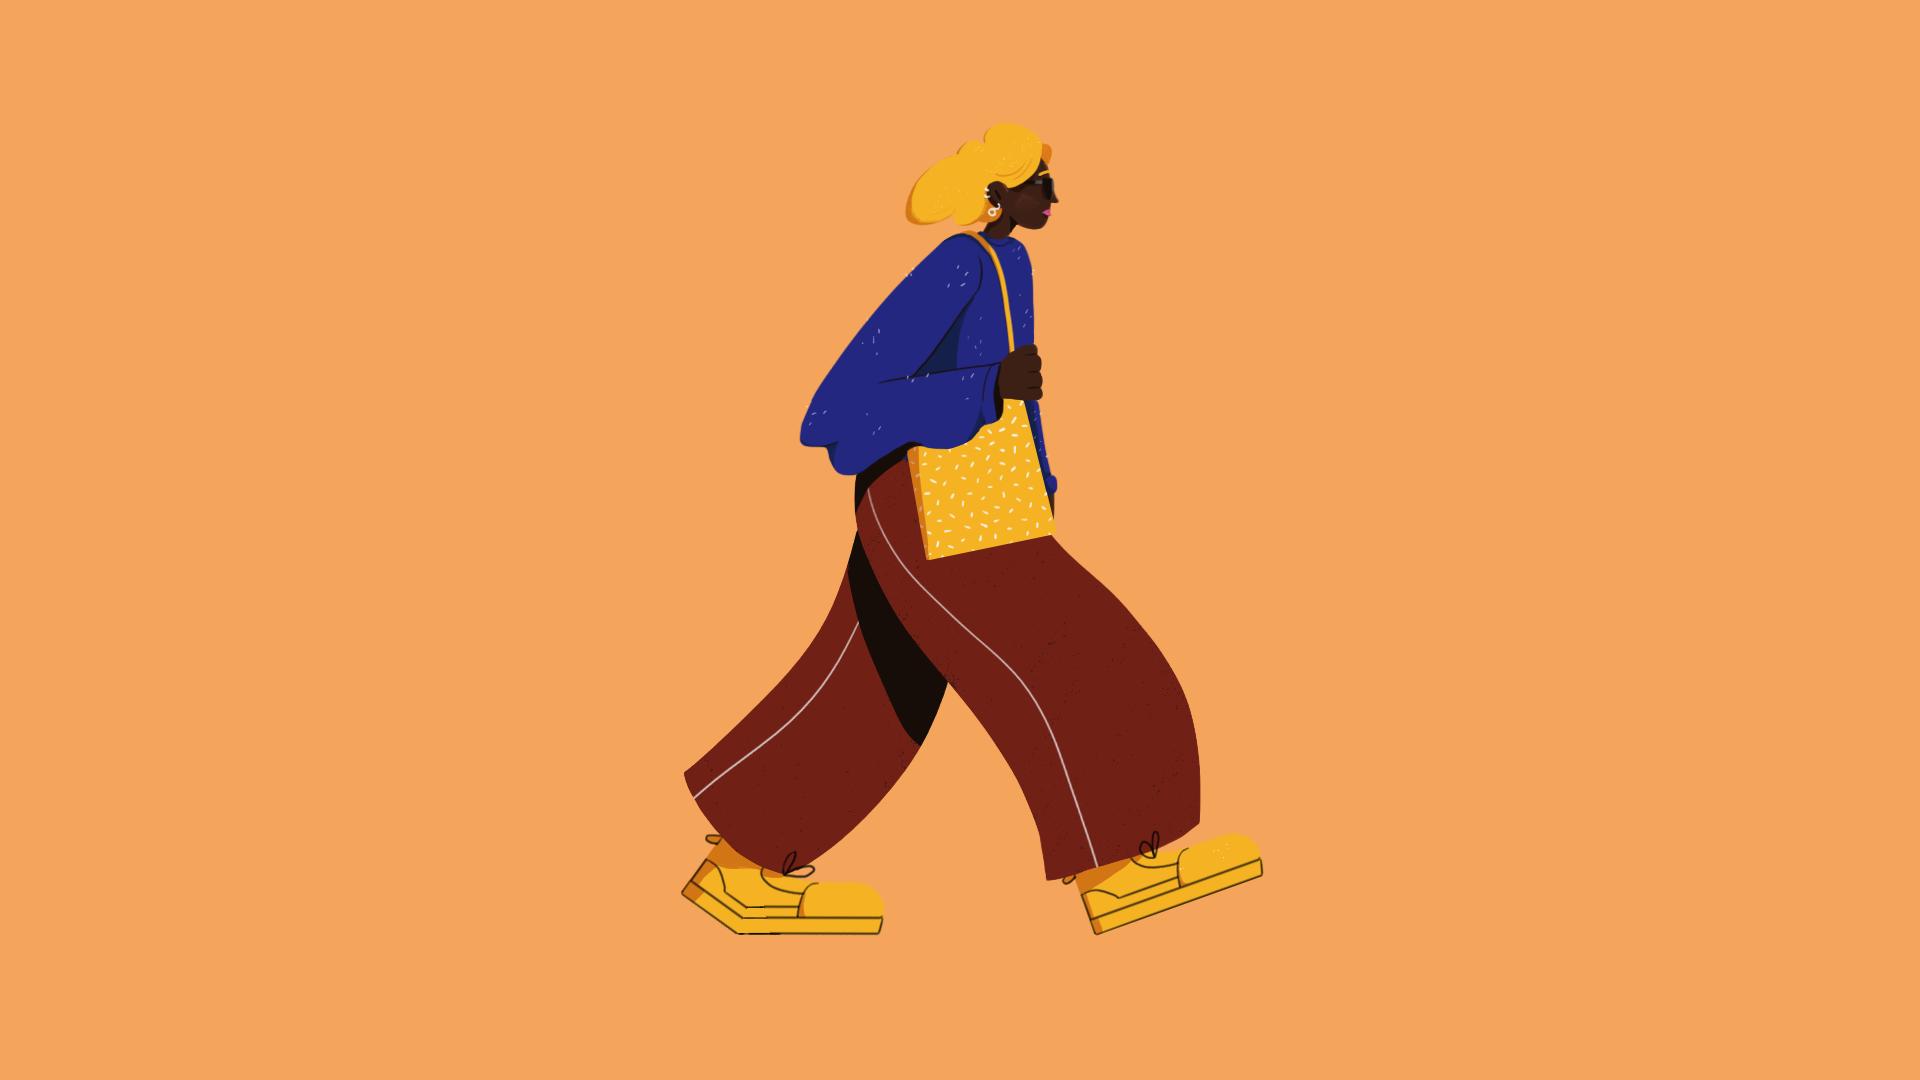 walking-gals-02.png